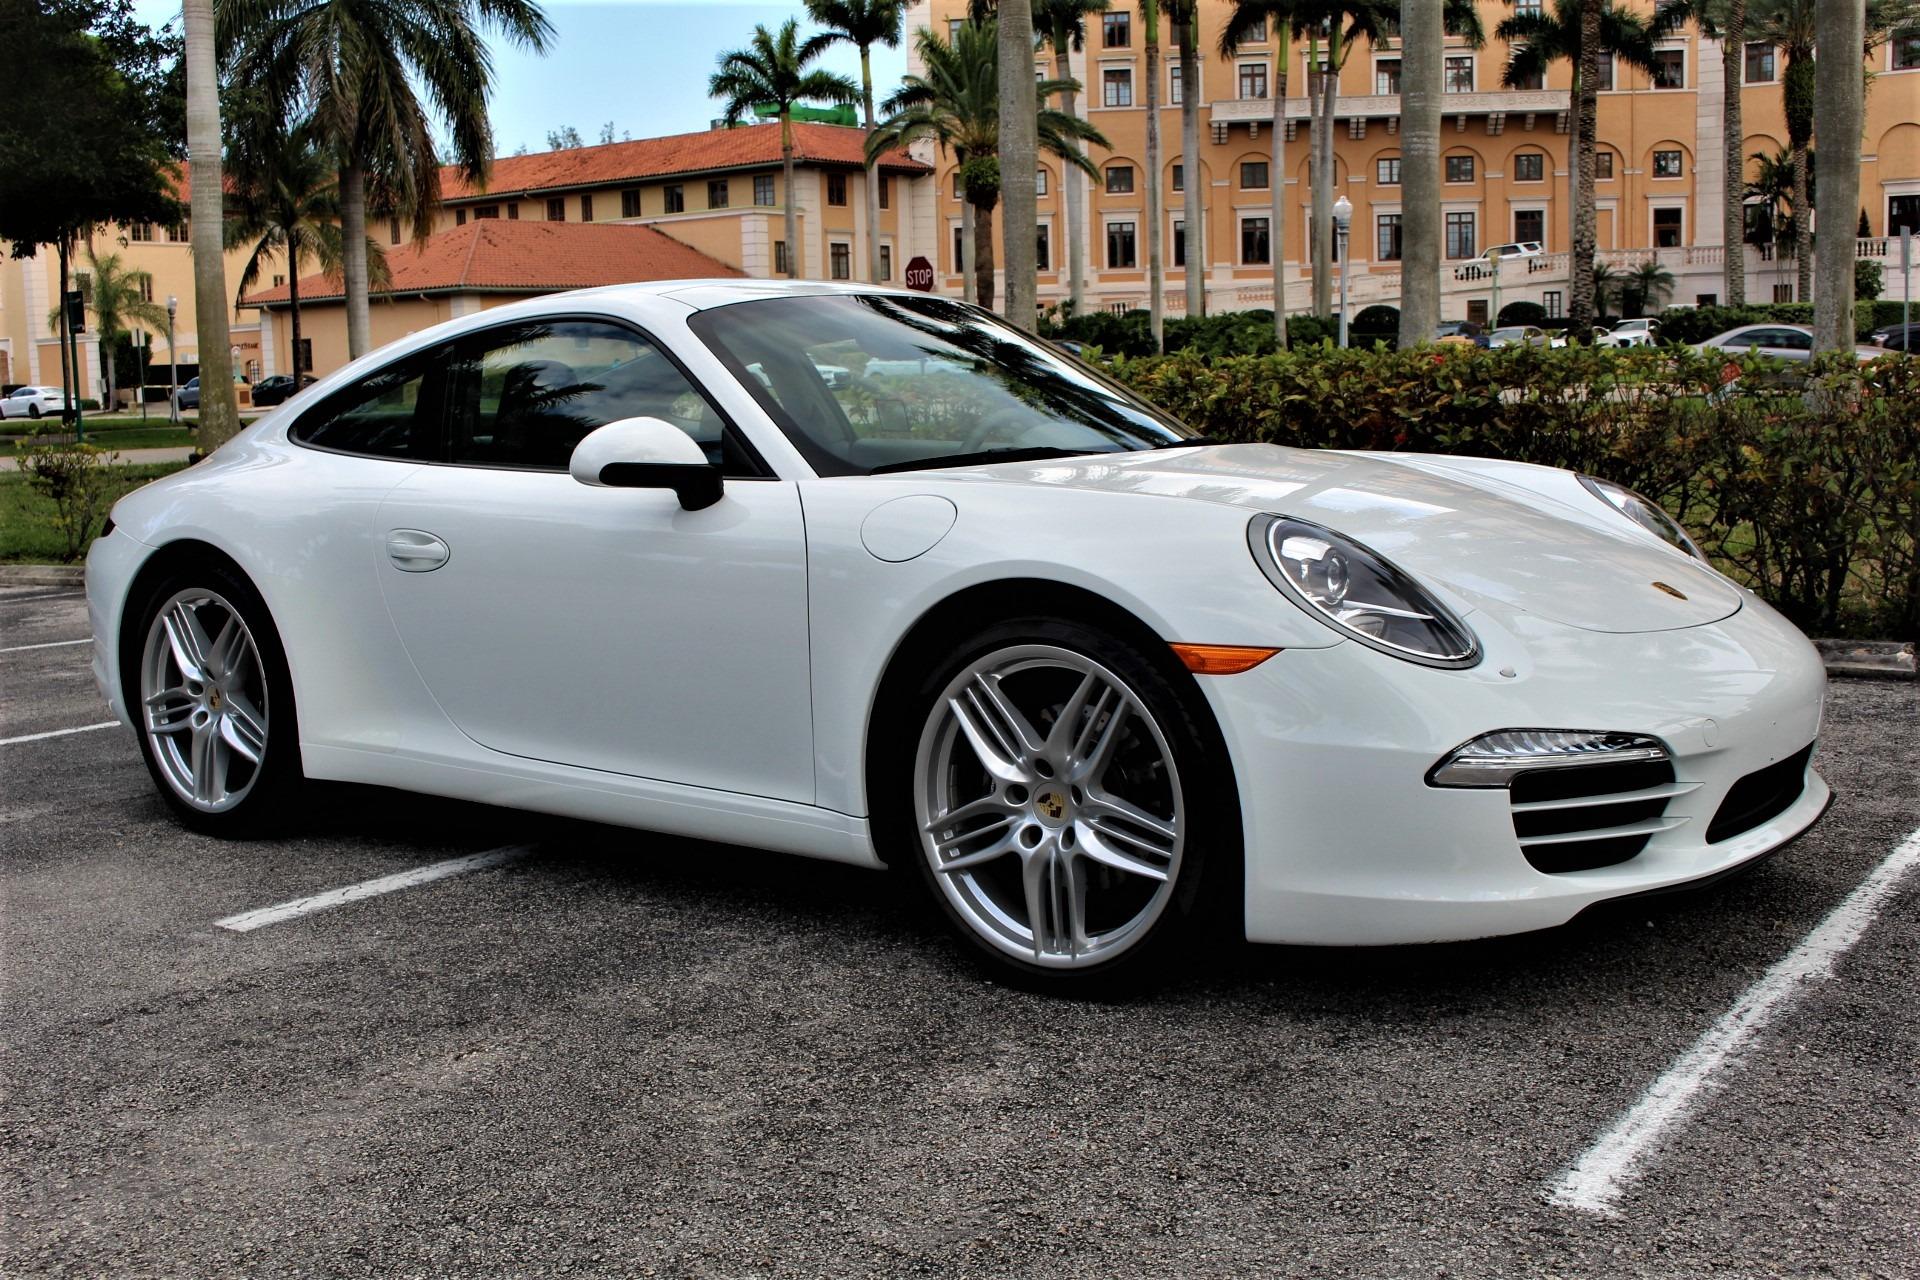 Used 2013 Porsche 911 Carrera for sale $79,850 at The Gables Sports Cars in Miami FL 33146 3